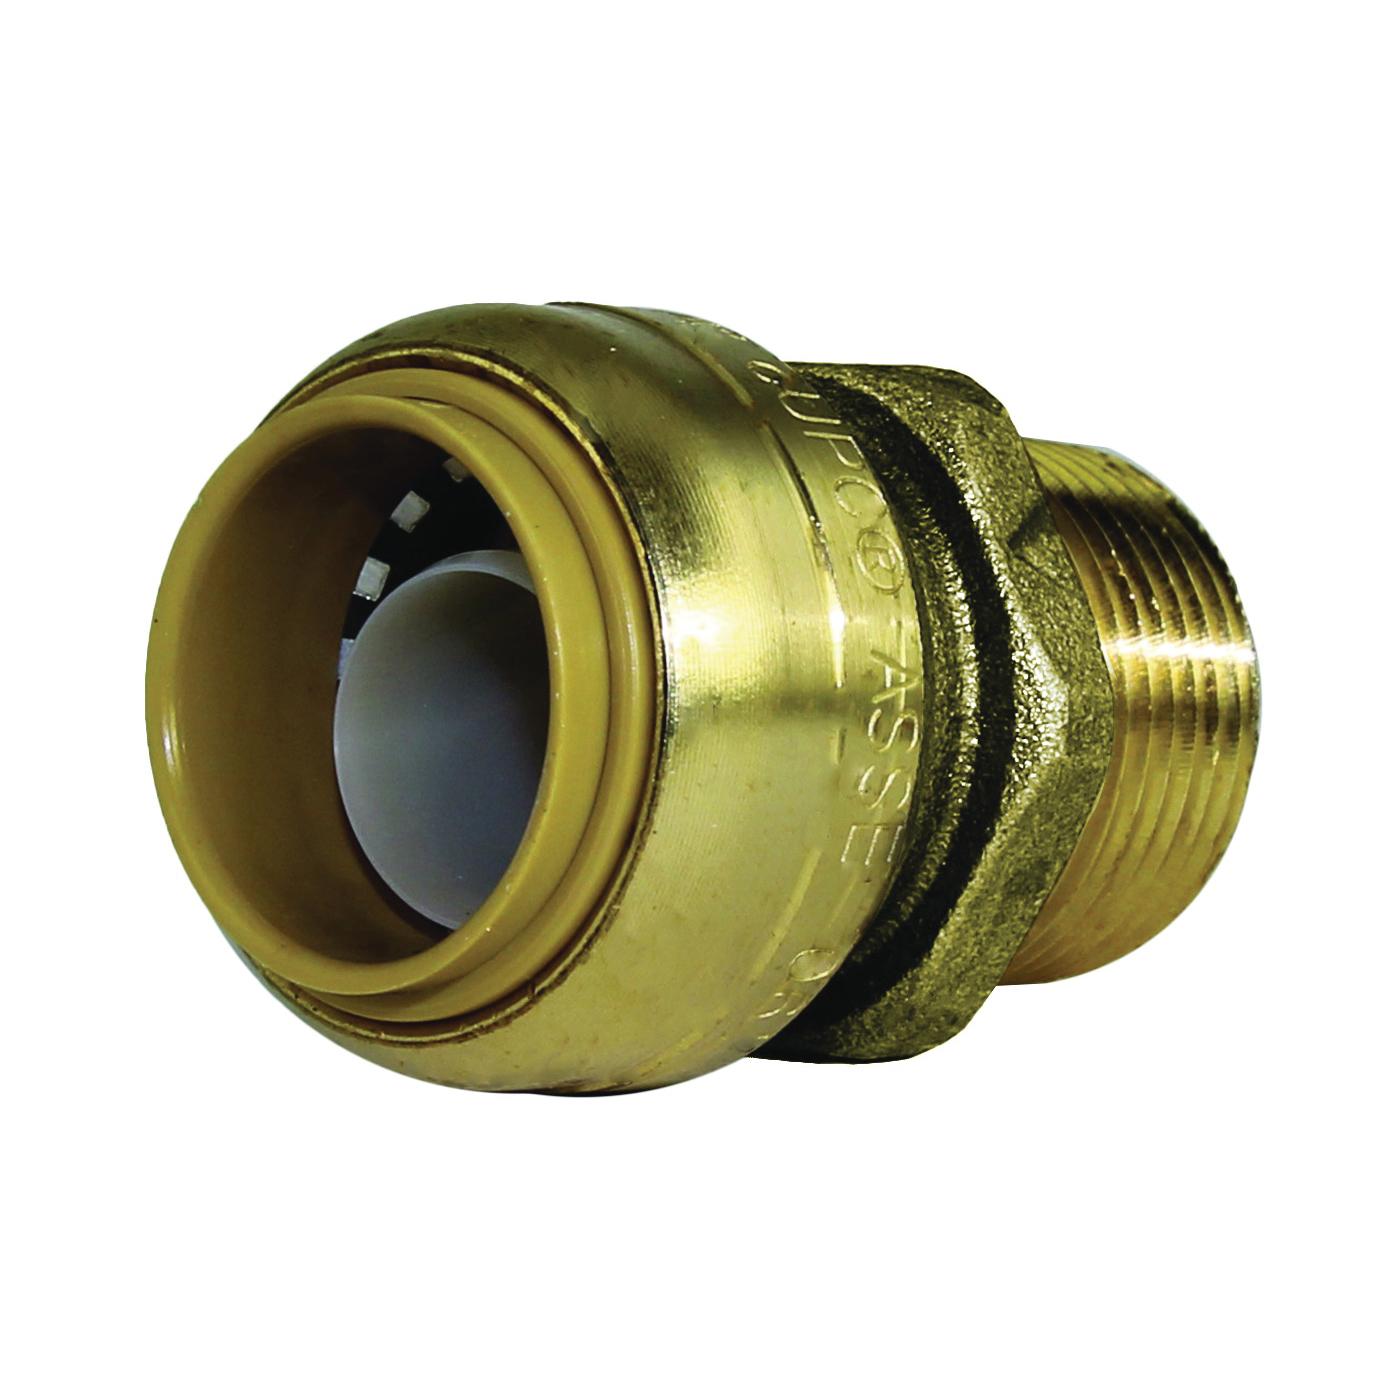 Picture of SharkBite U134LFA Pipe Connector, 3/4 in, MNPT x MNPT, Brass, 200 psi Pressure